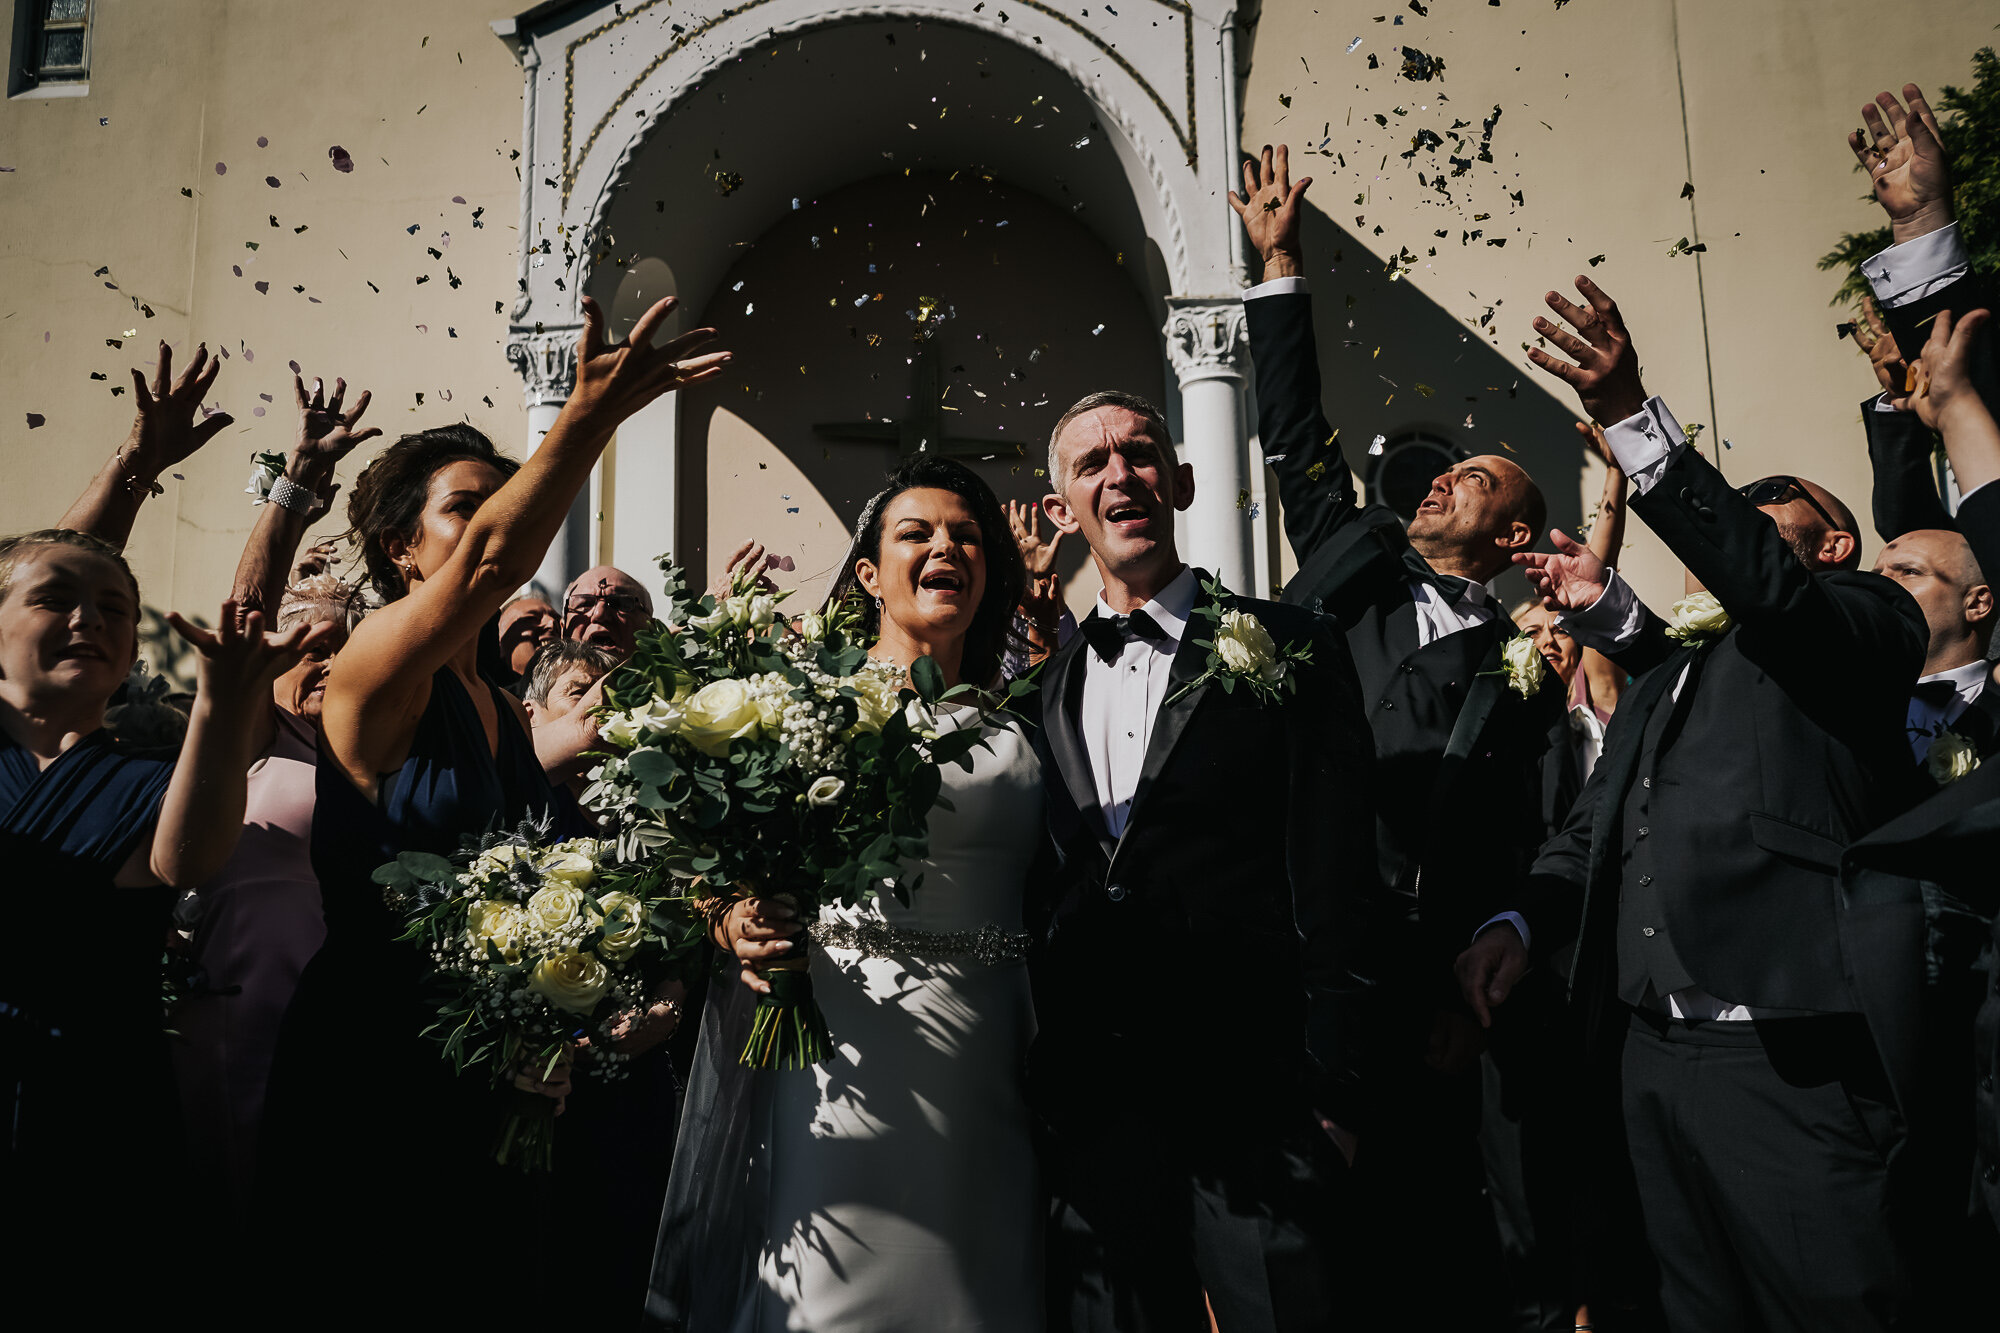 Clontarf Caste wedding photographer Wedding Photography dublin ireland wedding photographer (33 of 58).jpg